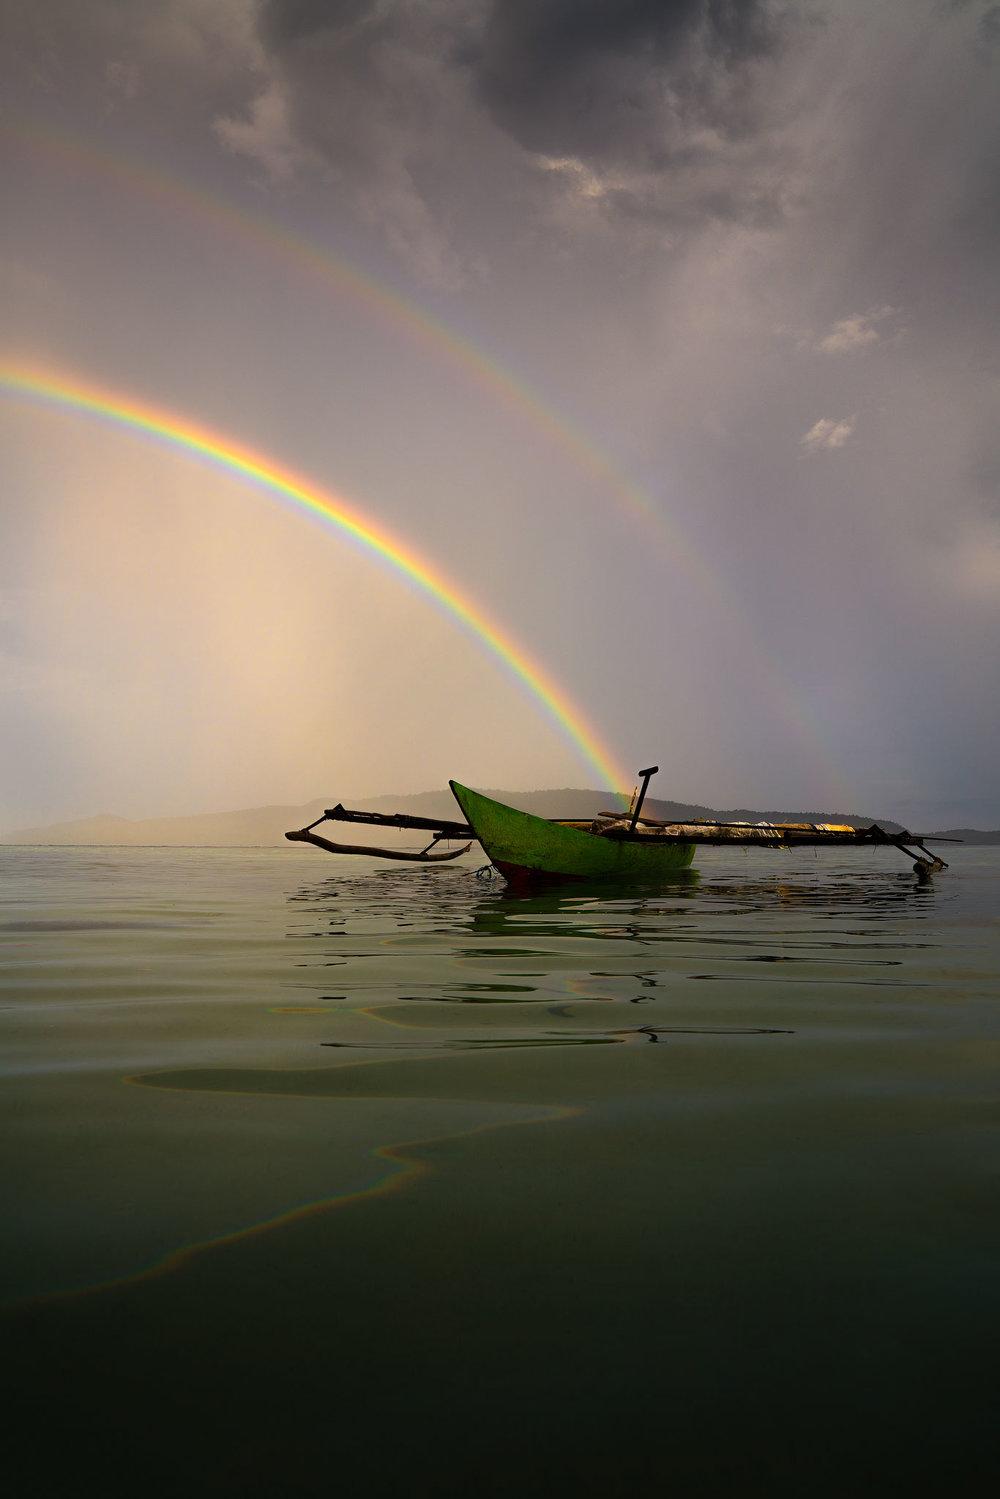 RajaAmpat_BoatRainbow_01.jpg